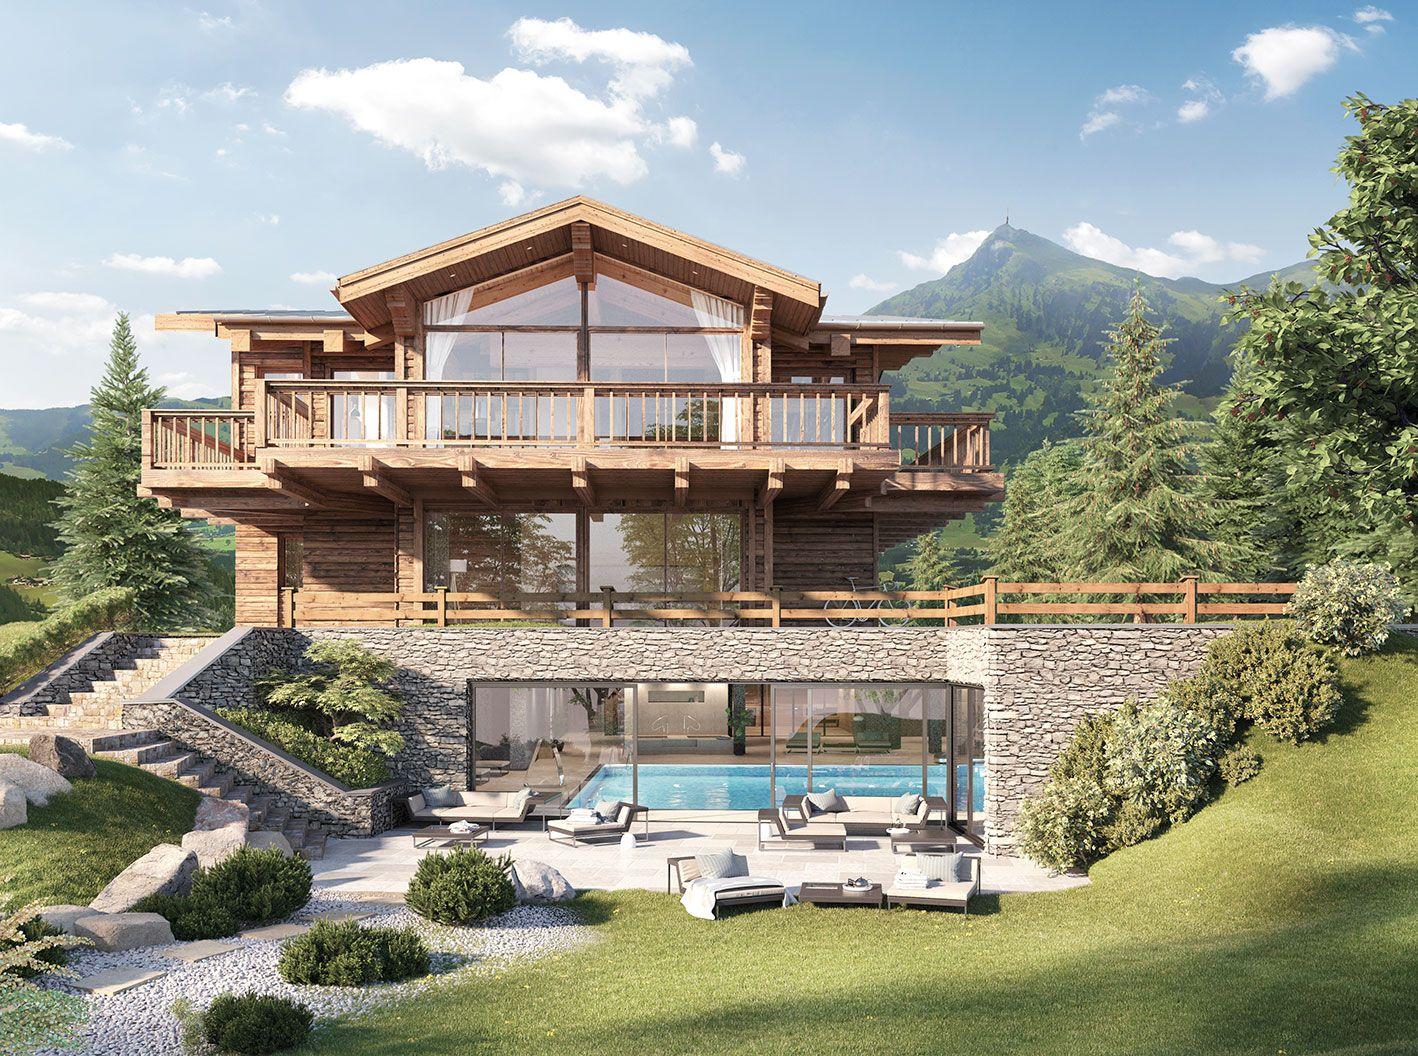 Photo of Bezaubernde Chalets mit unverbaubarem Blick in die Berge in bester Lage in Kitzb…